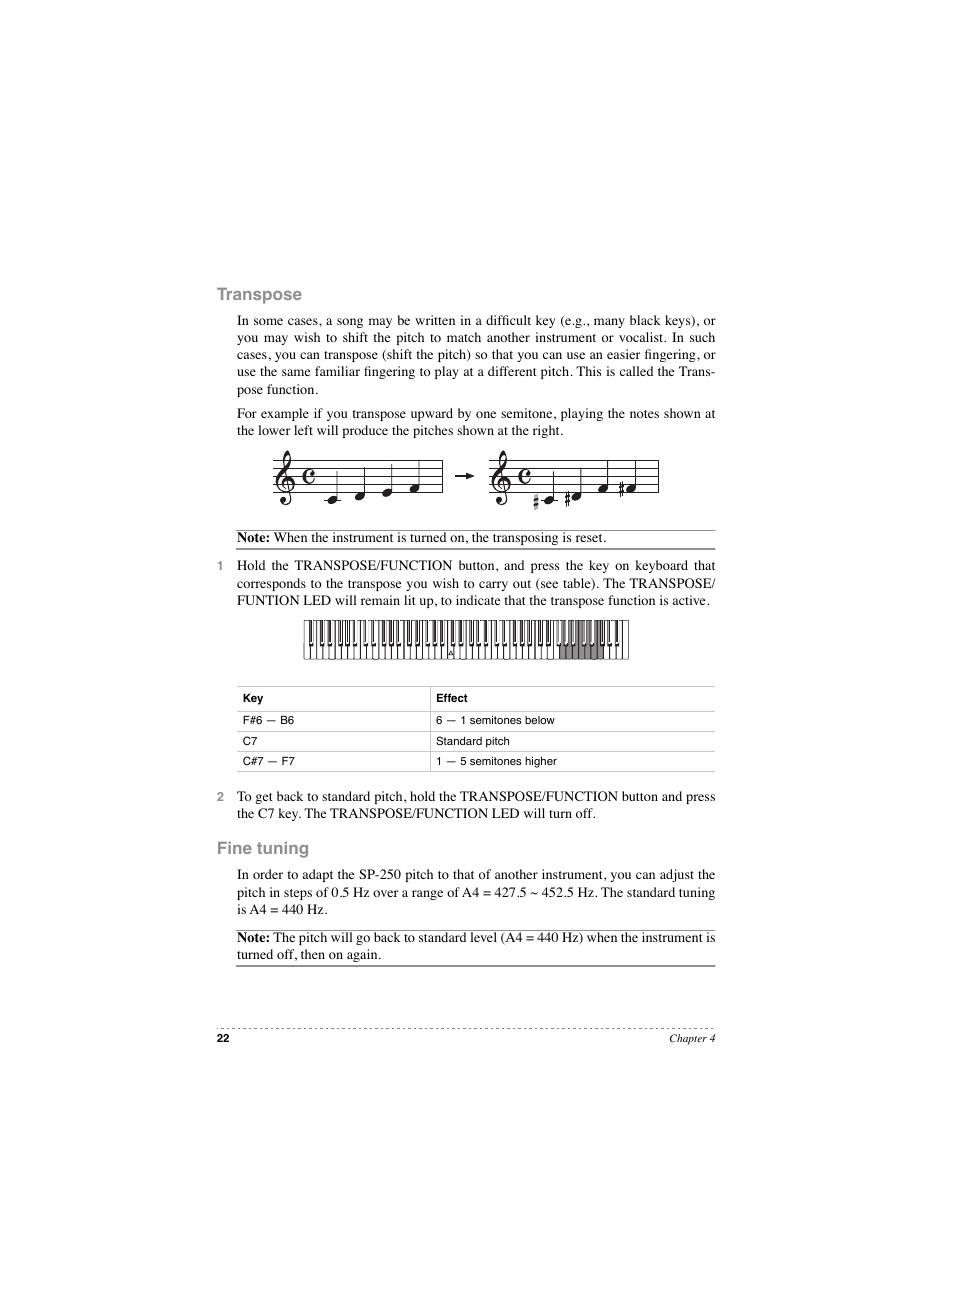 Transpose fine tuning, Transpose, Fine tuning | KORG SP 250